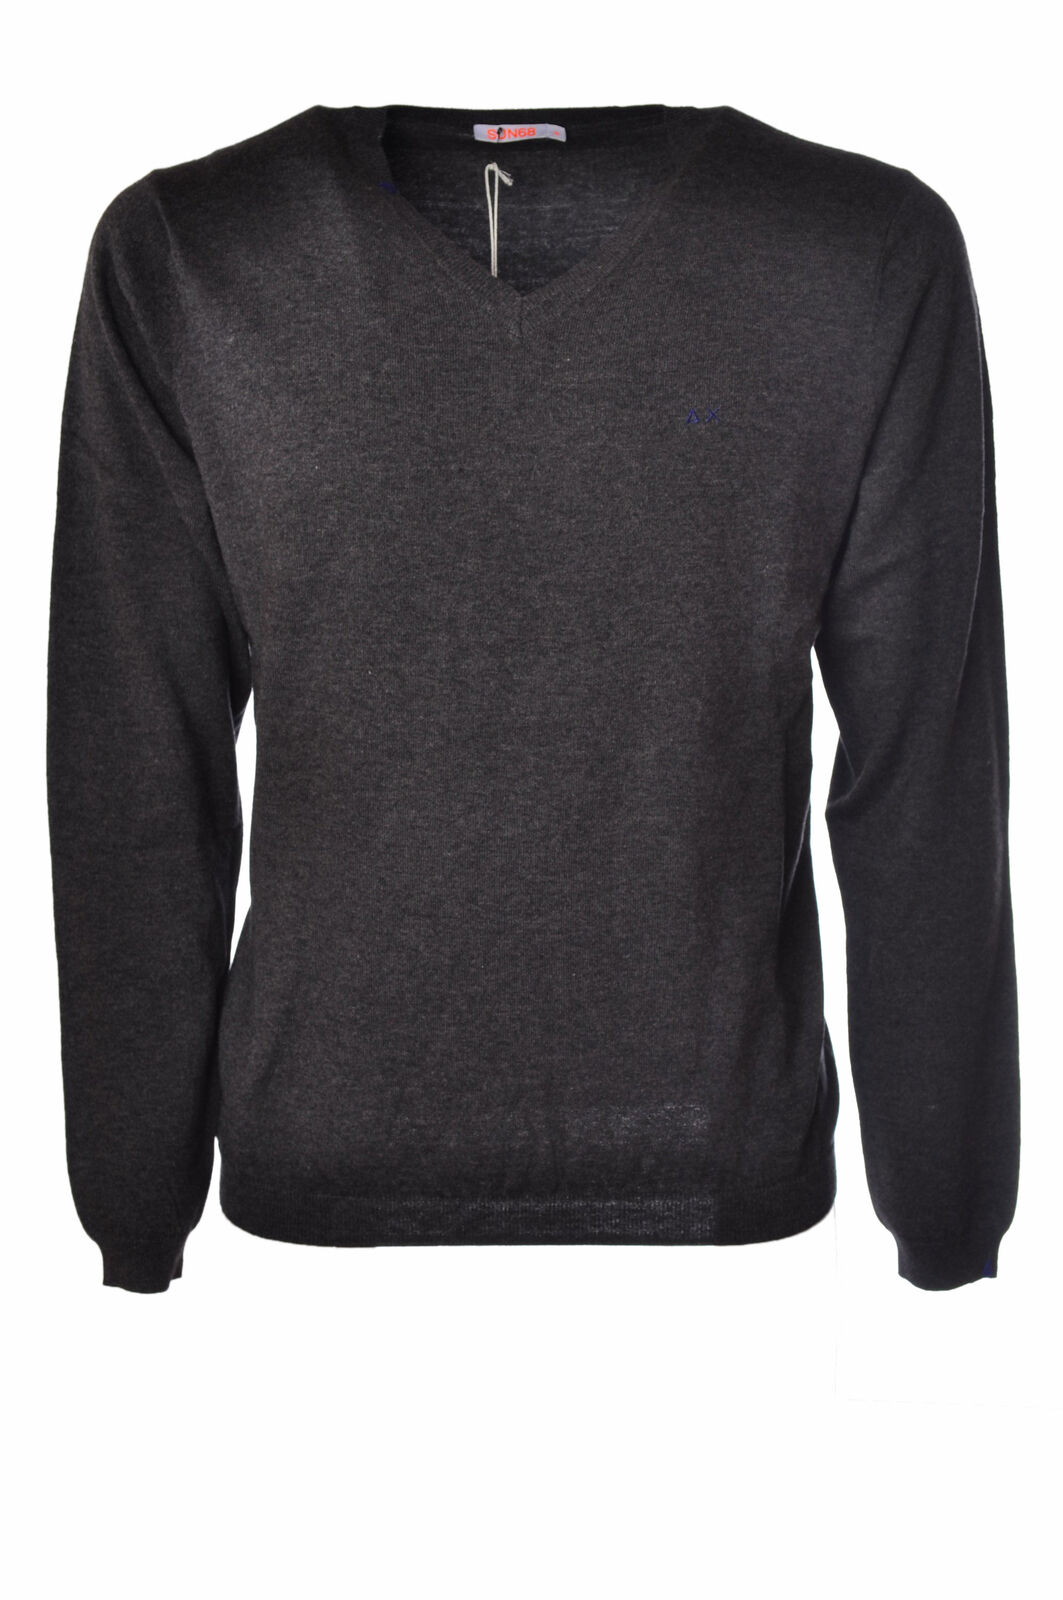 Sun 68  -  Sweaters - Male - Grau - 2511226N173833